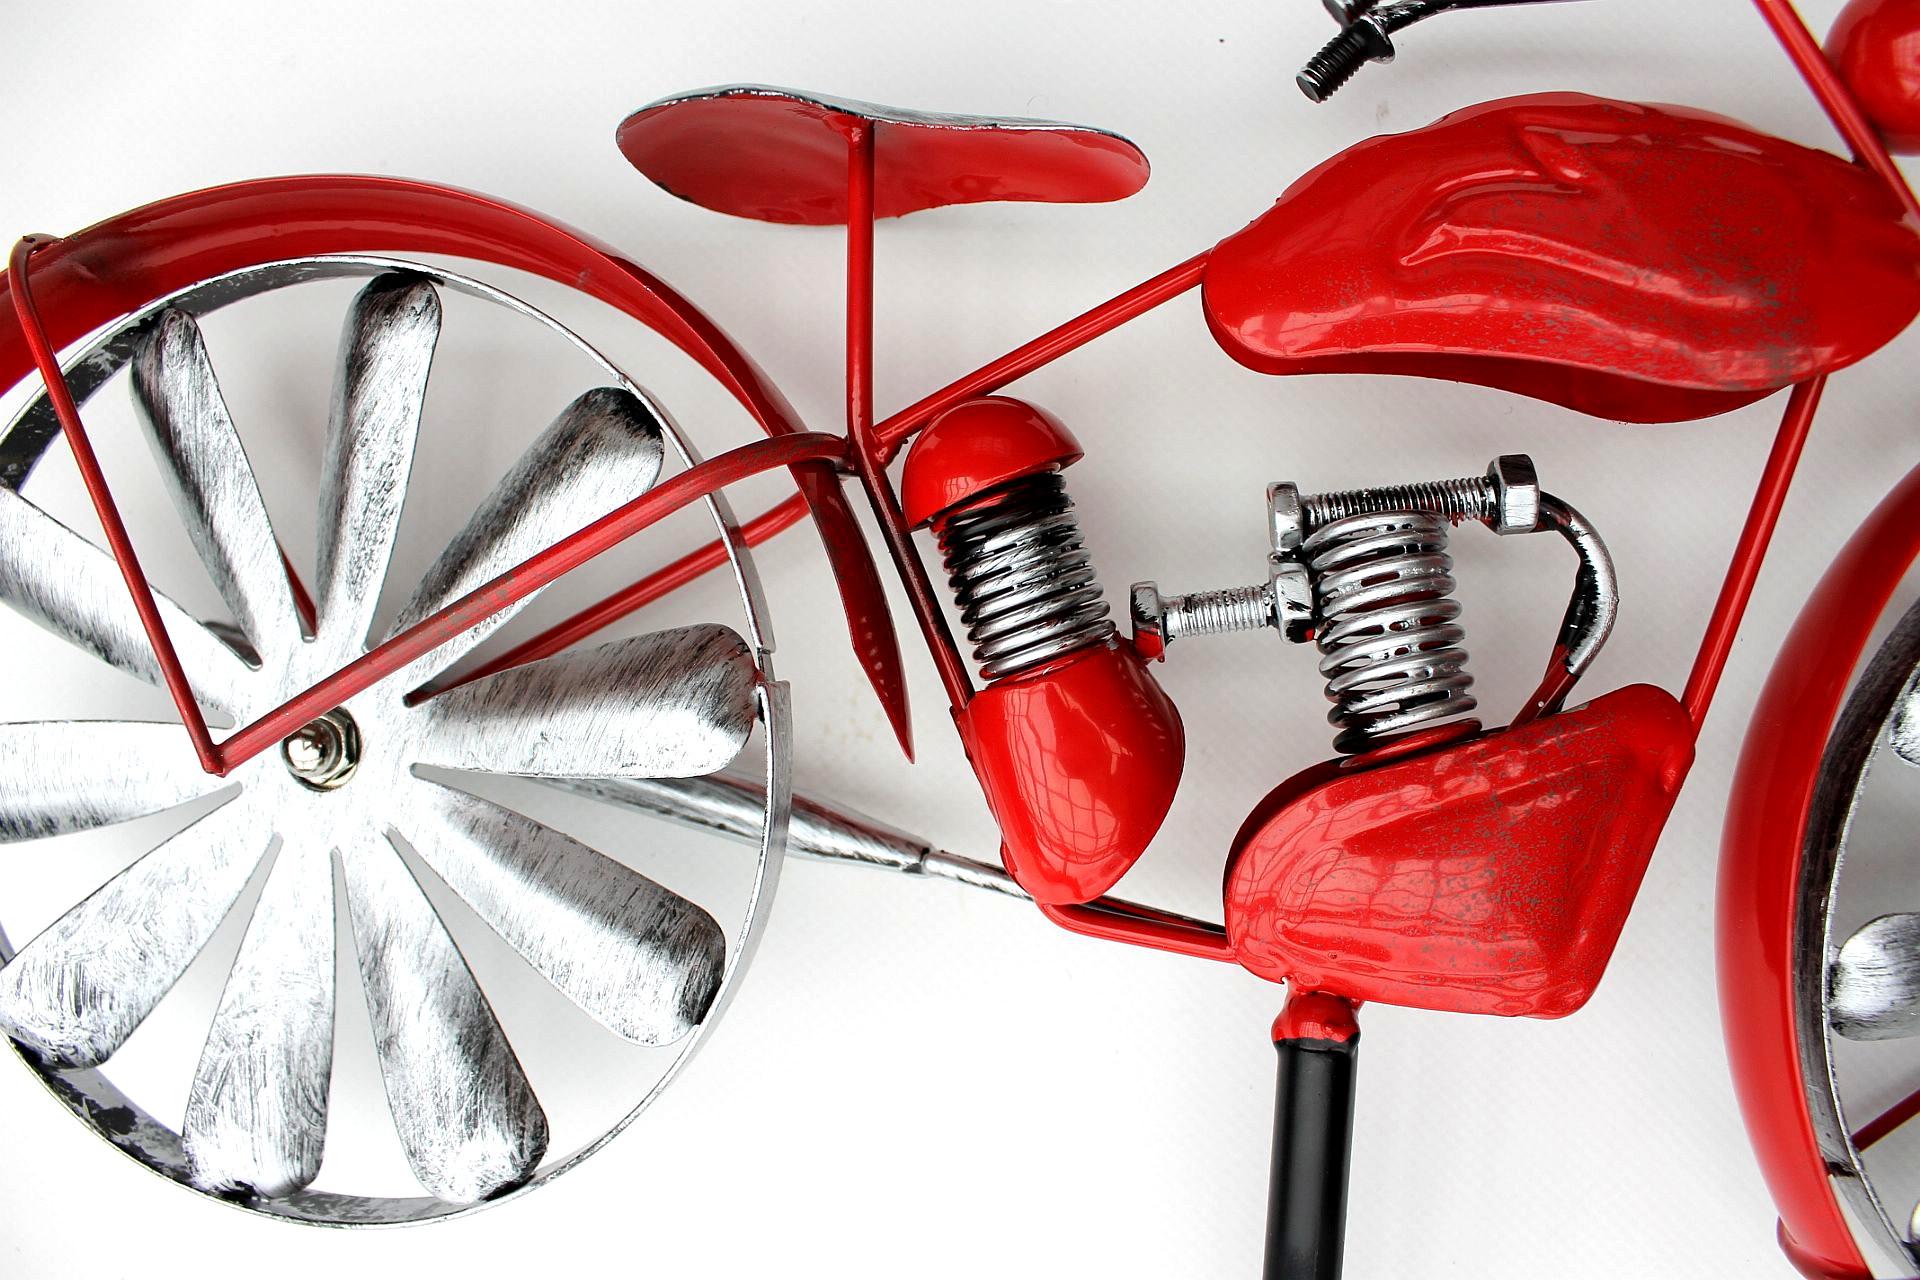 Moulin à vent métal Carillon Vélo Métal éolienne Bicylce Red Gartendeko